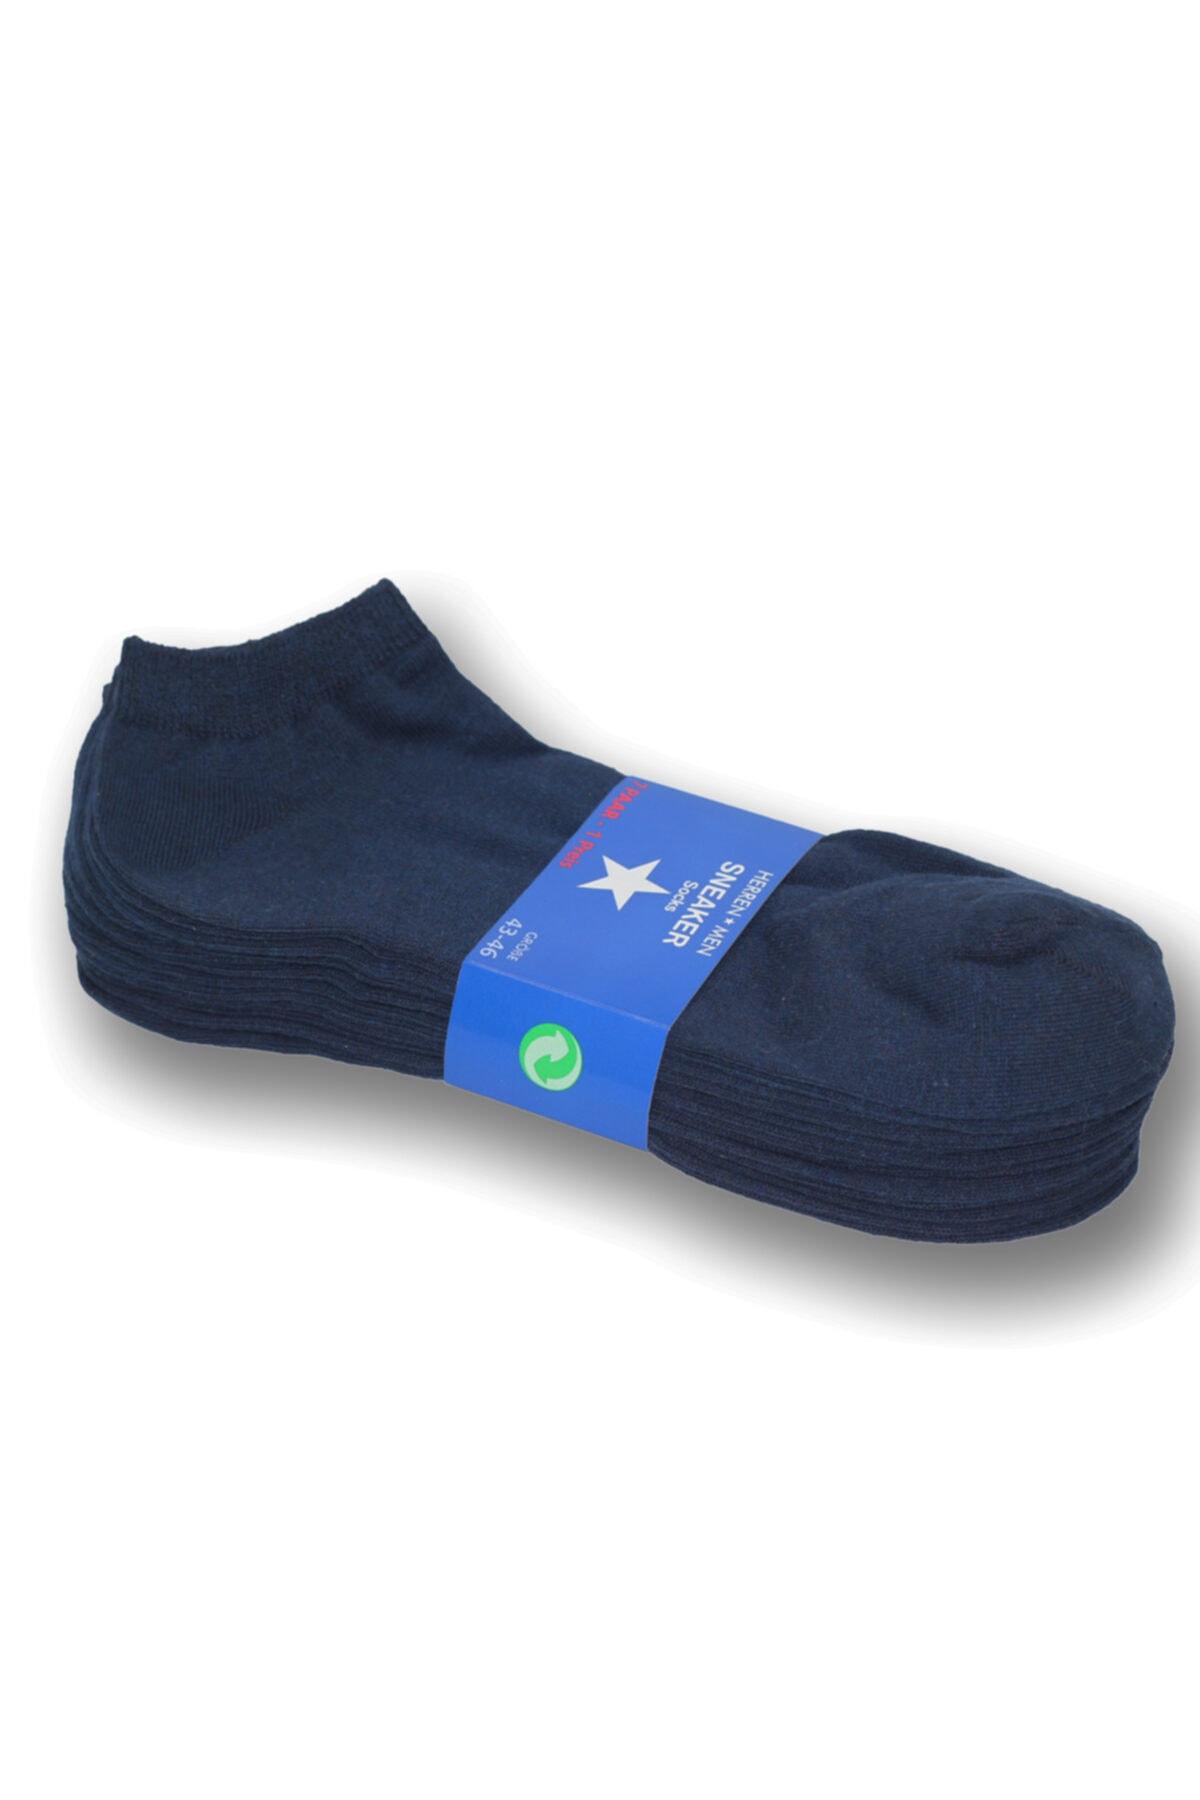 topsocks 7'li Penye Patik Çorap 1